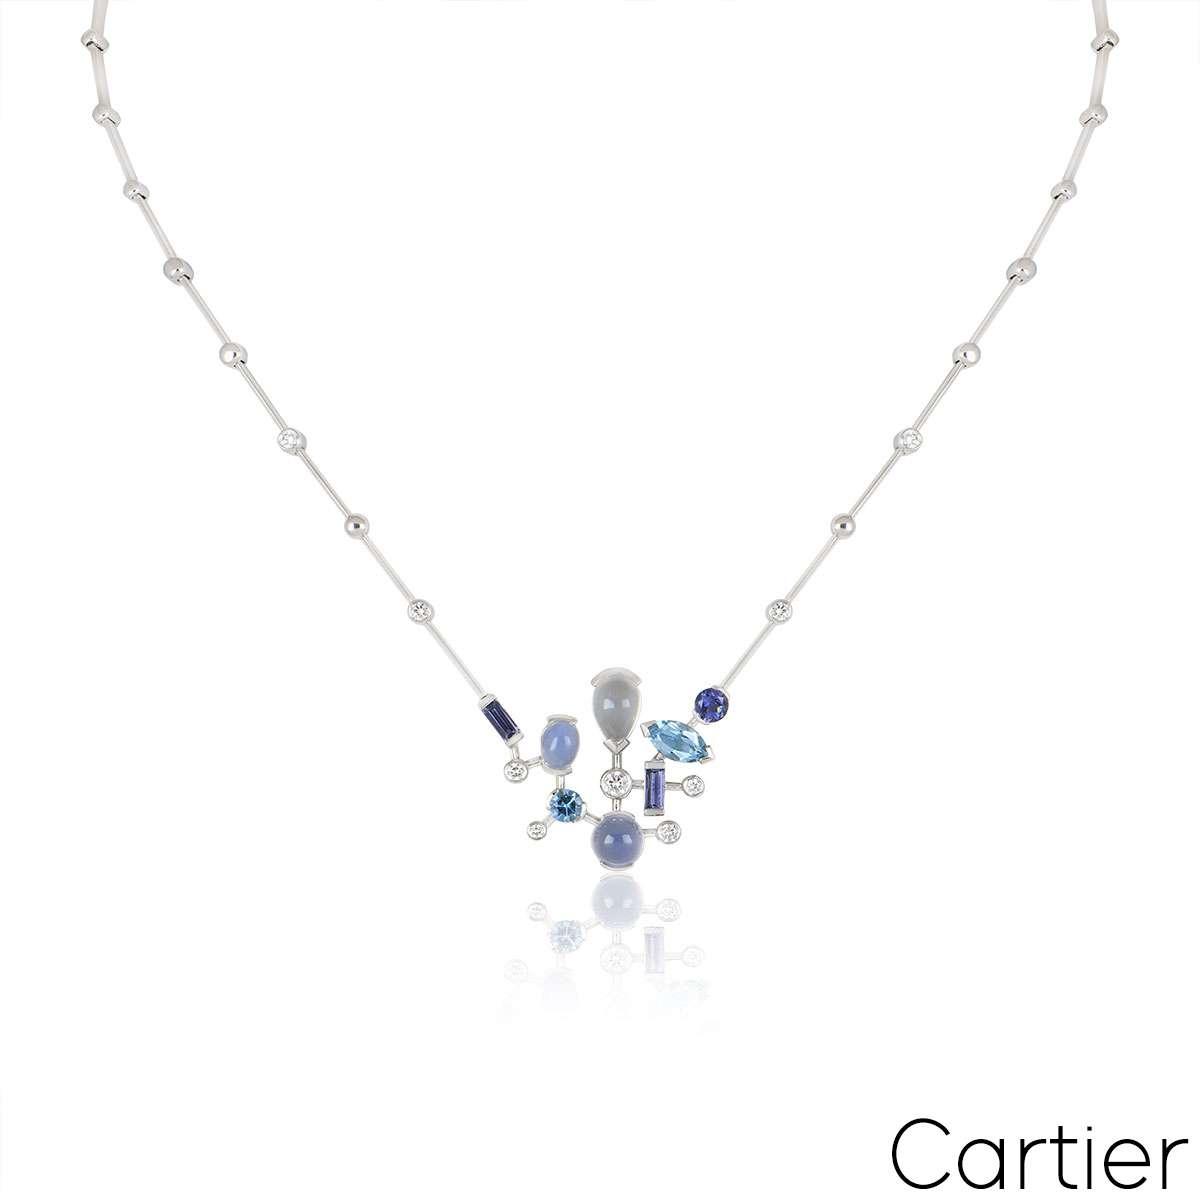 Cartier White Gold Meli Melo Necklace